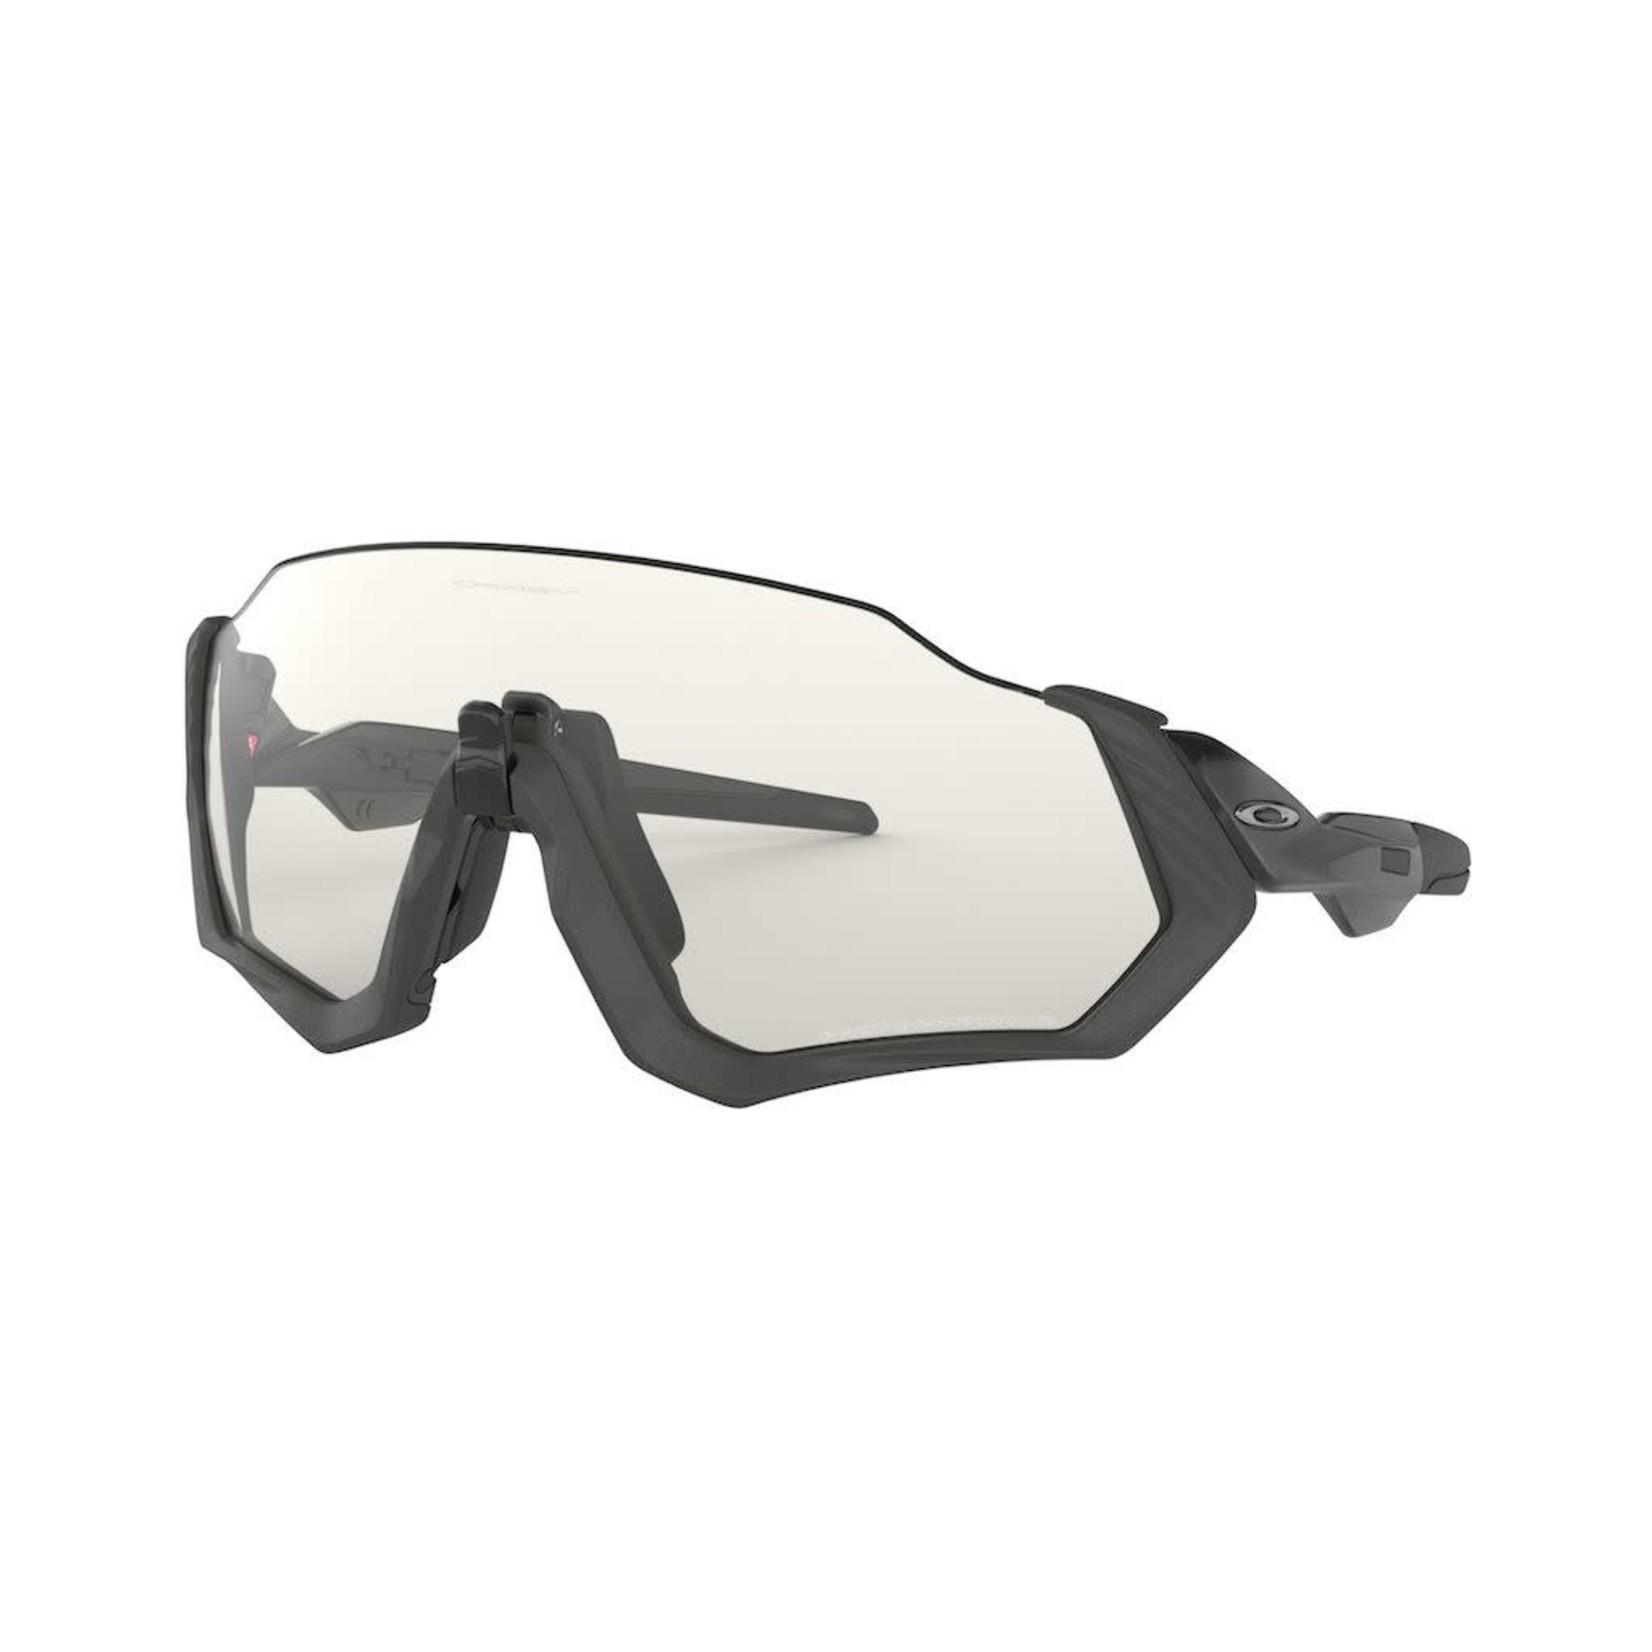 Oakley Oakley Flight Jacket Steel Black Ink Clear Black Iridium Photocromatic